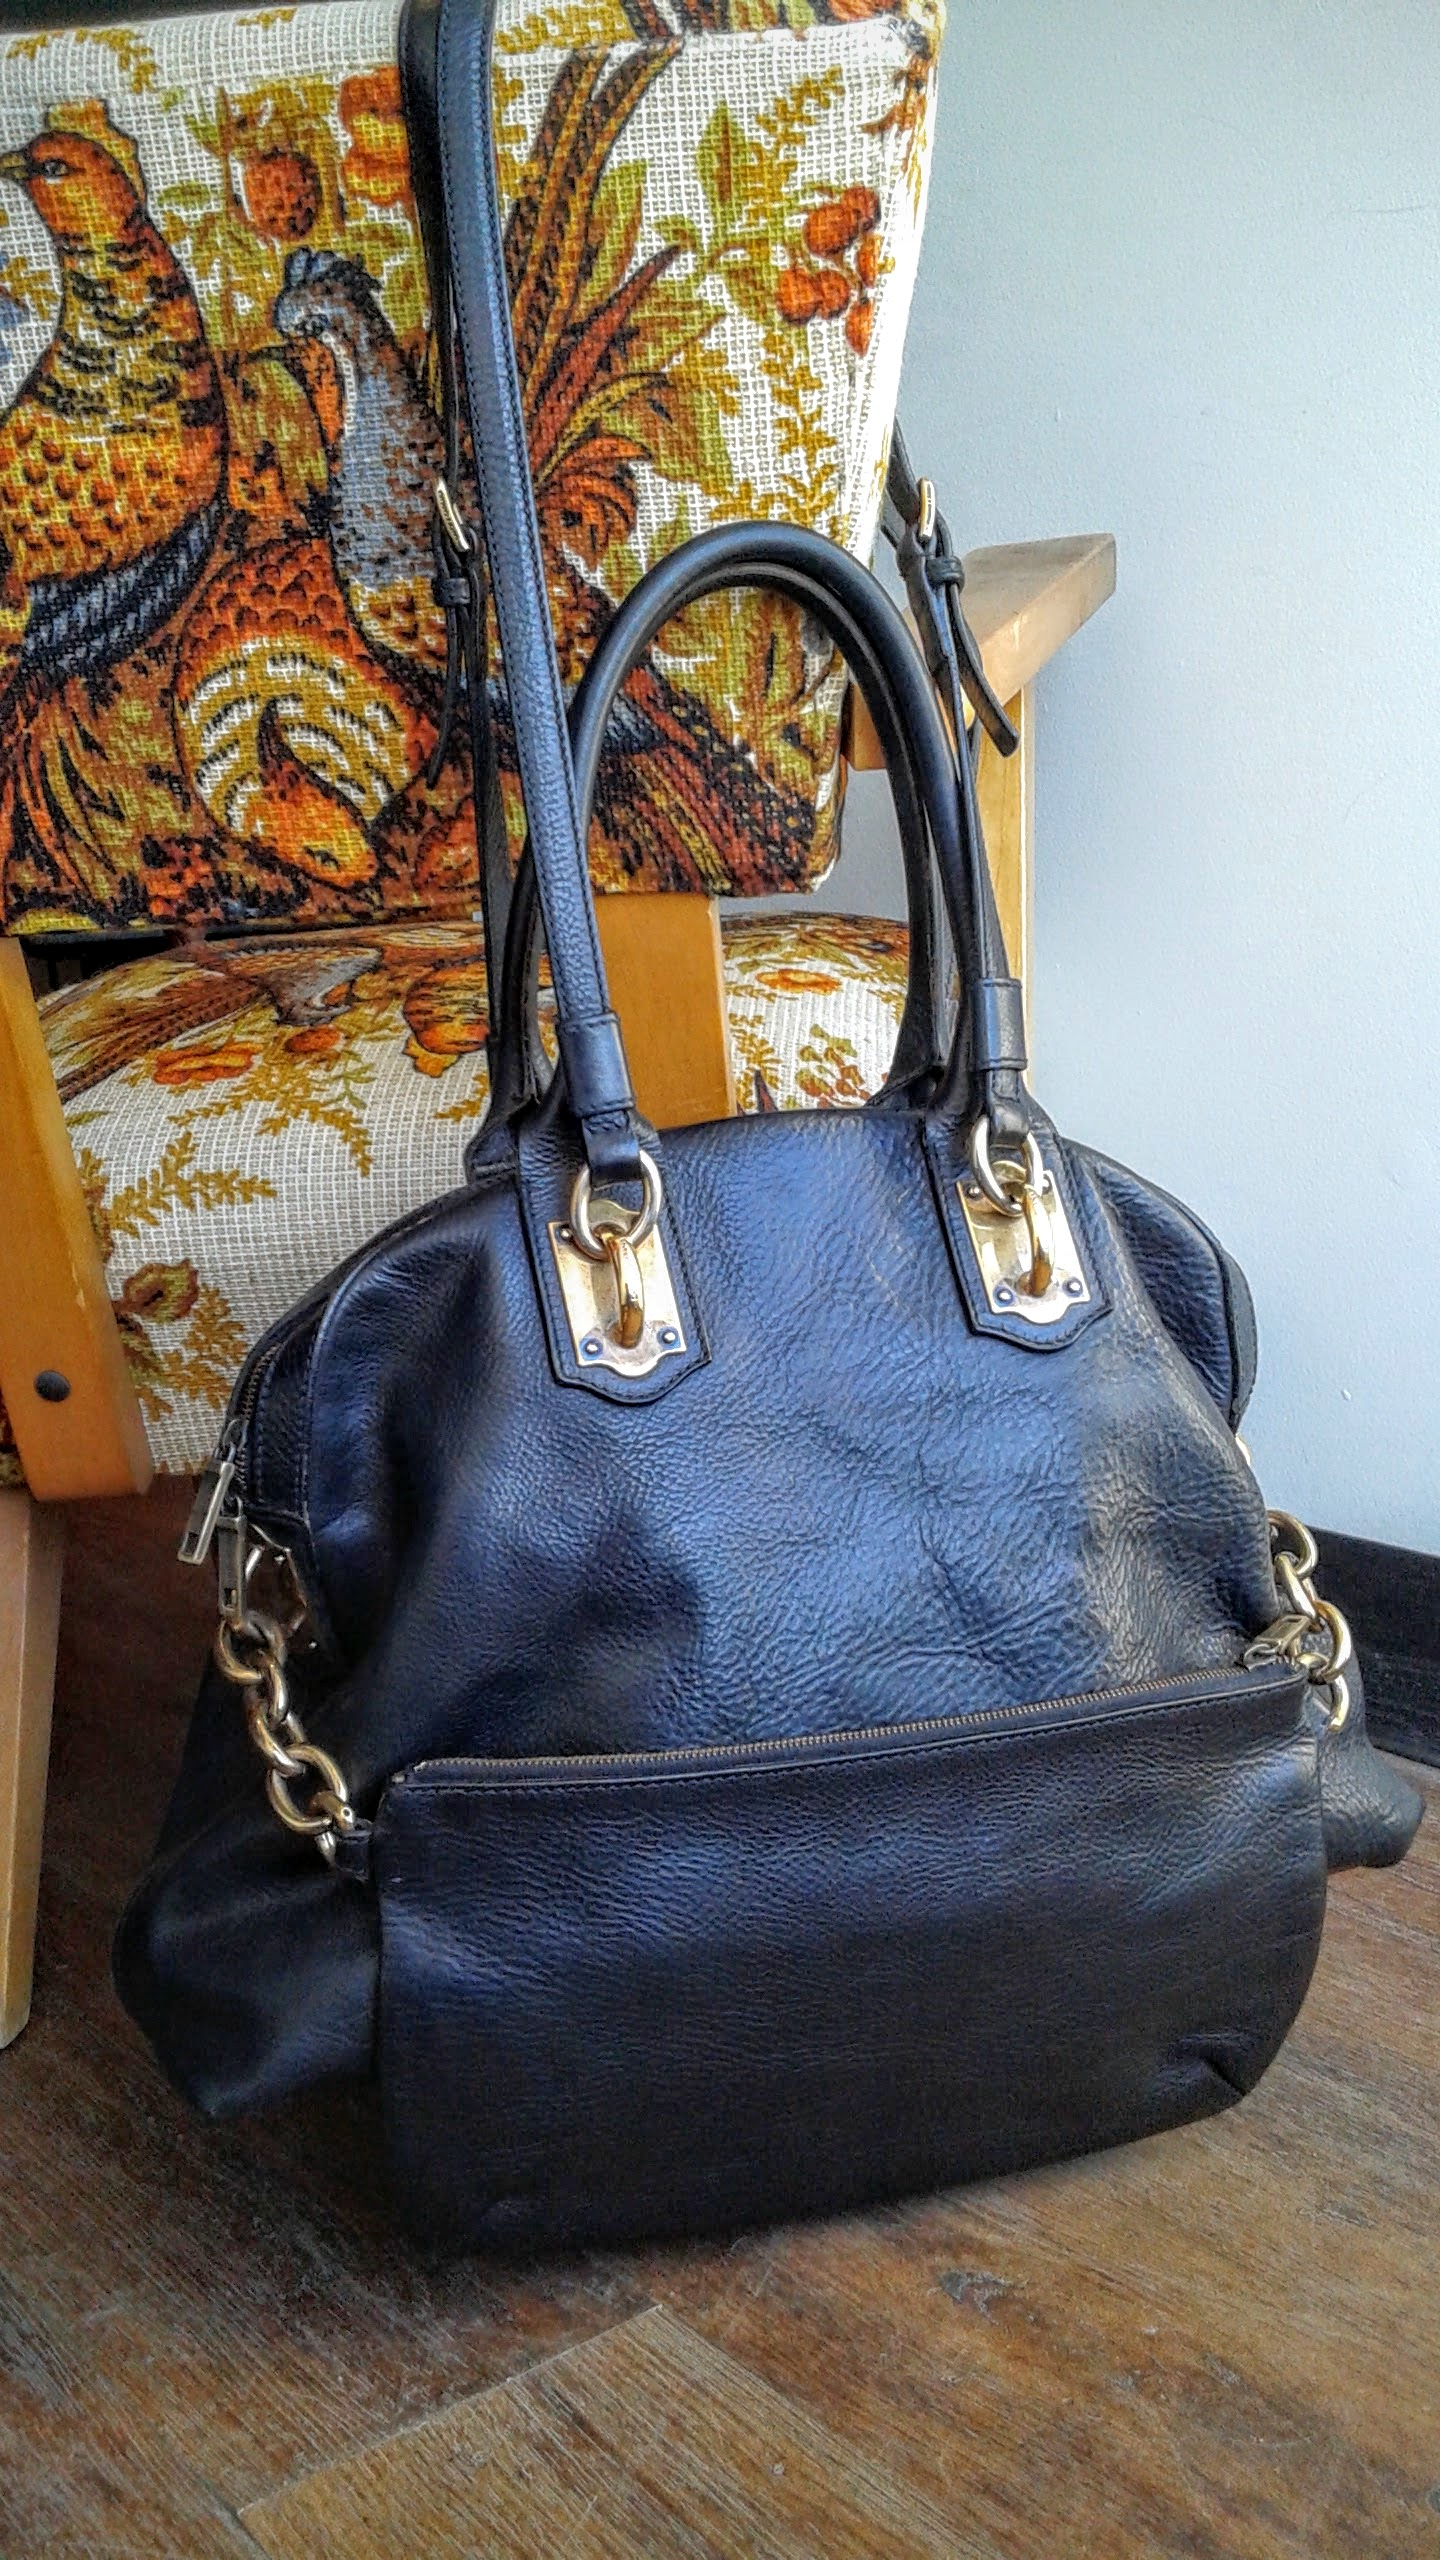 Dolce & Gabana bag, $350